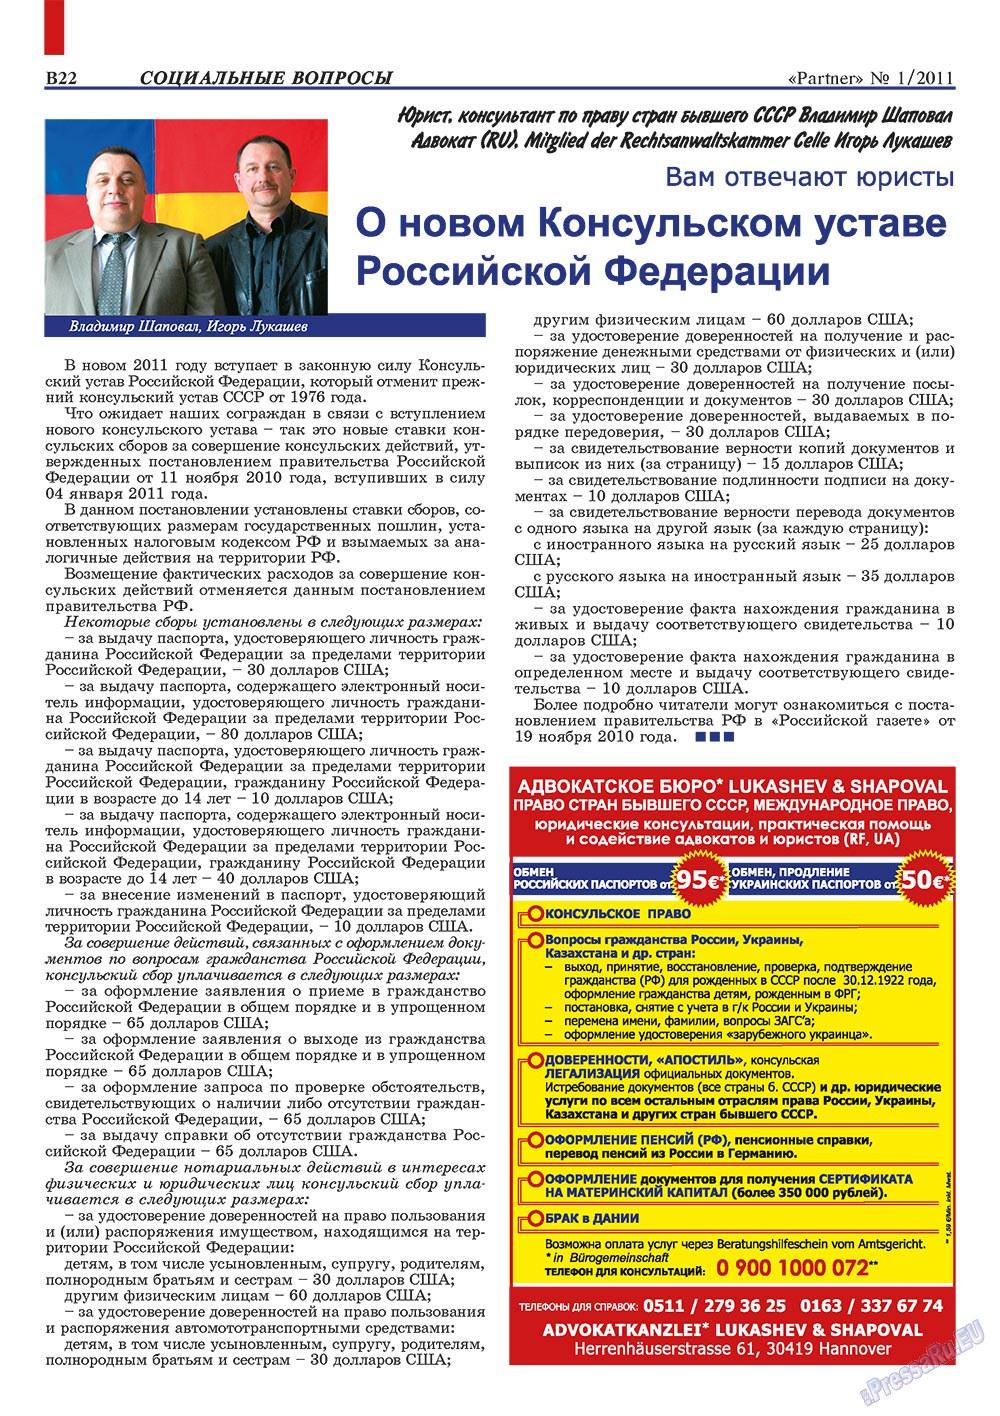 Партнер-север (журнал). 2011 год, номер 1, стр. 32